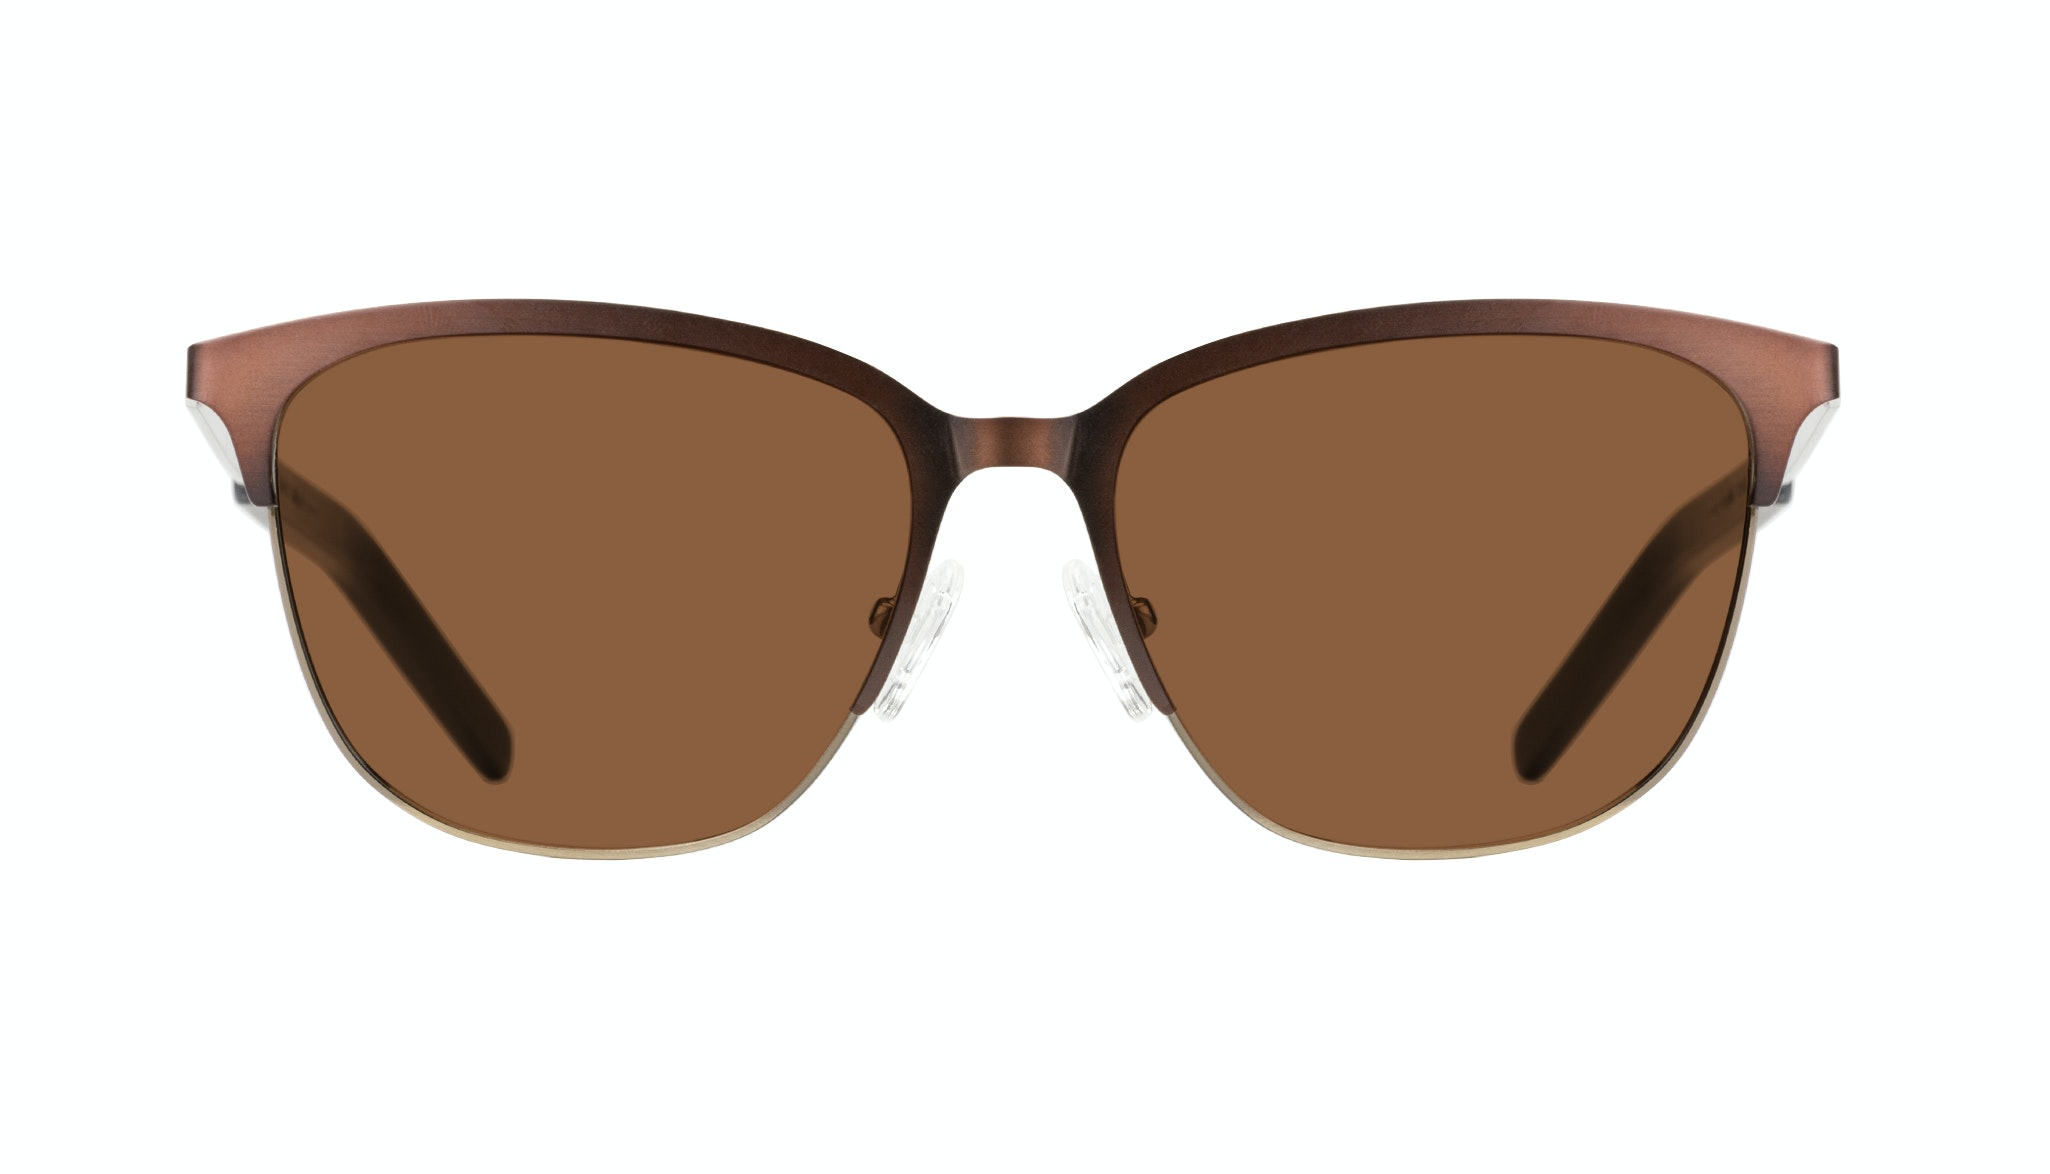 Affordable Fashion Glasses Rectangle Sunglasses Men Legacy Mud Gold